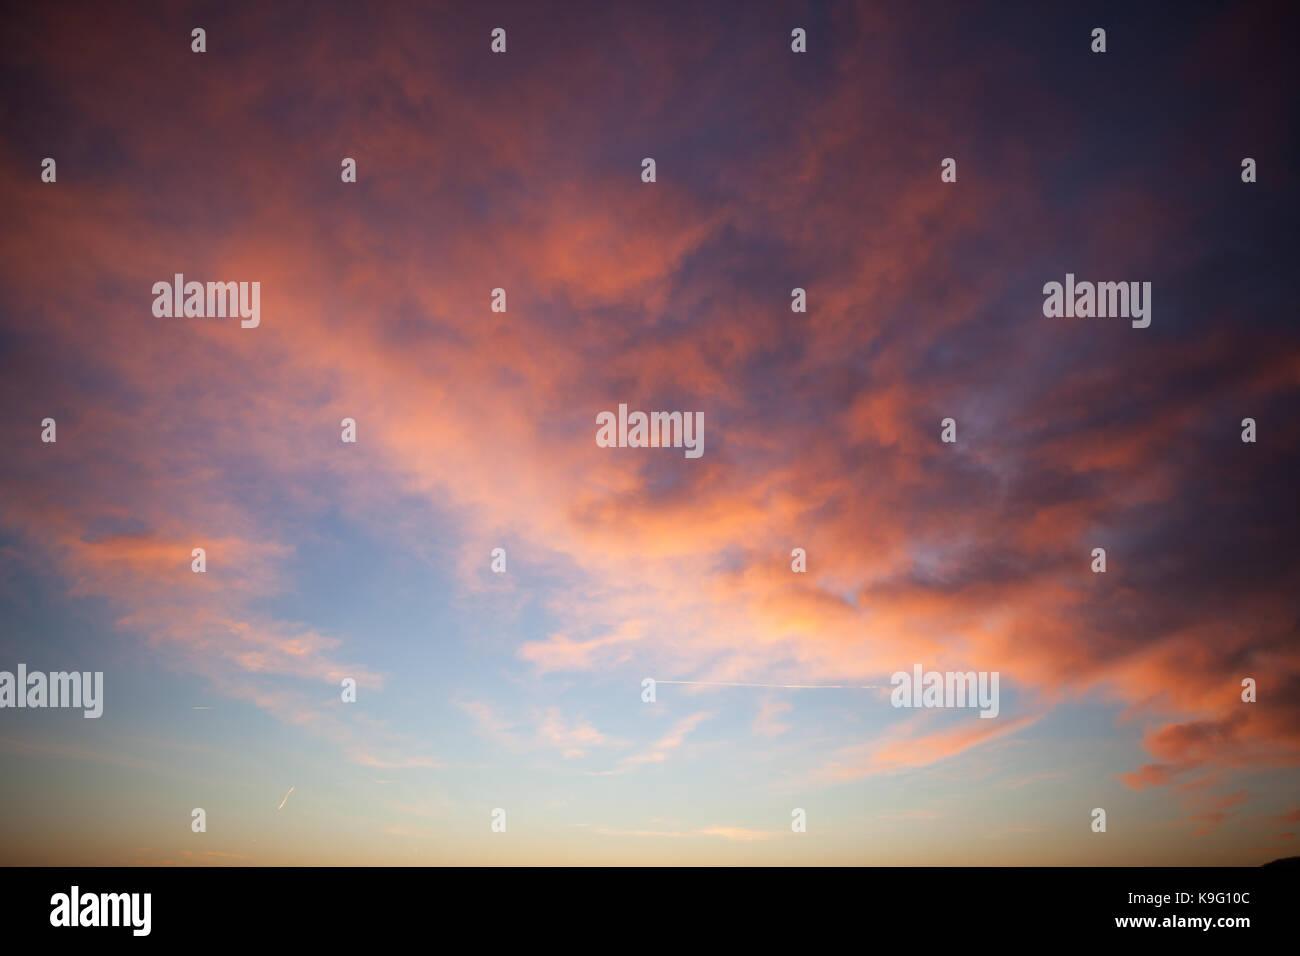 Colorful background: sky overlay, setting sun. - Stock Image